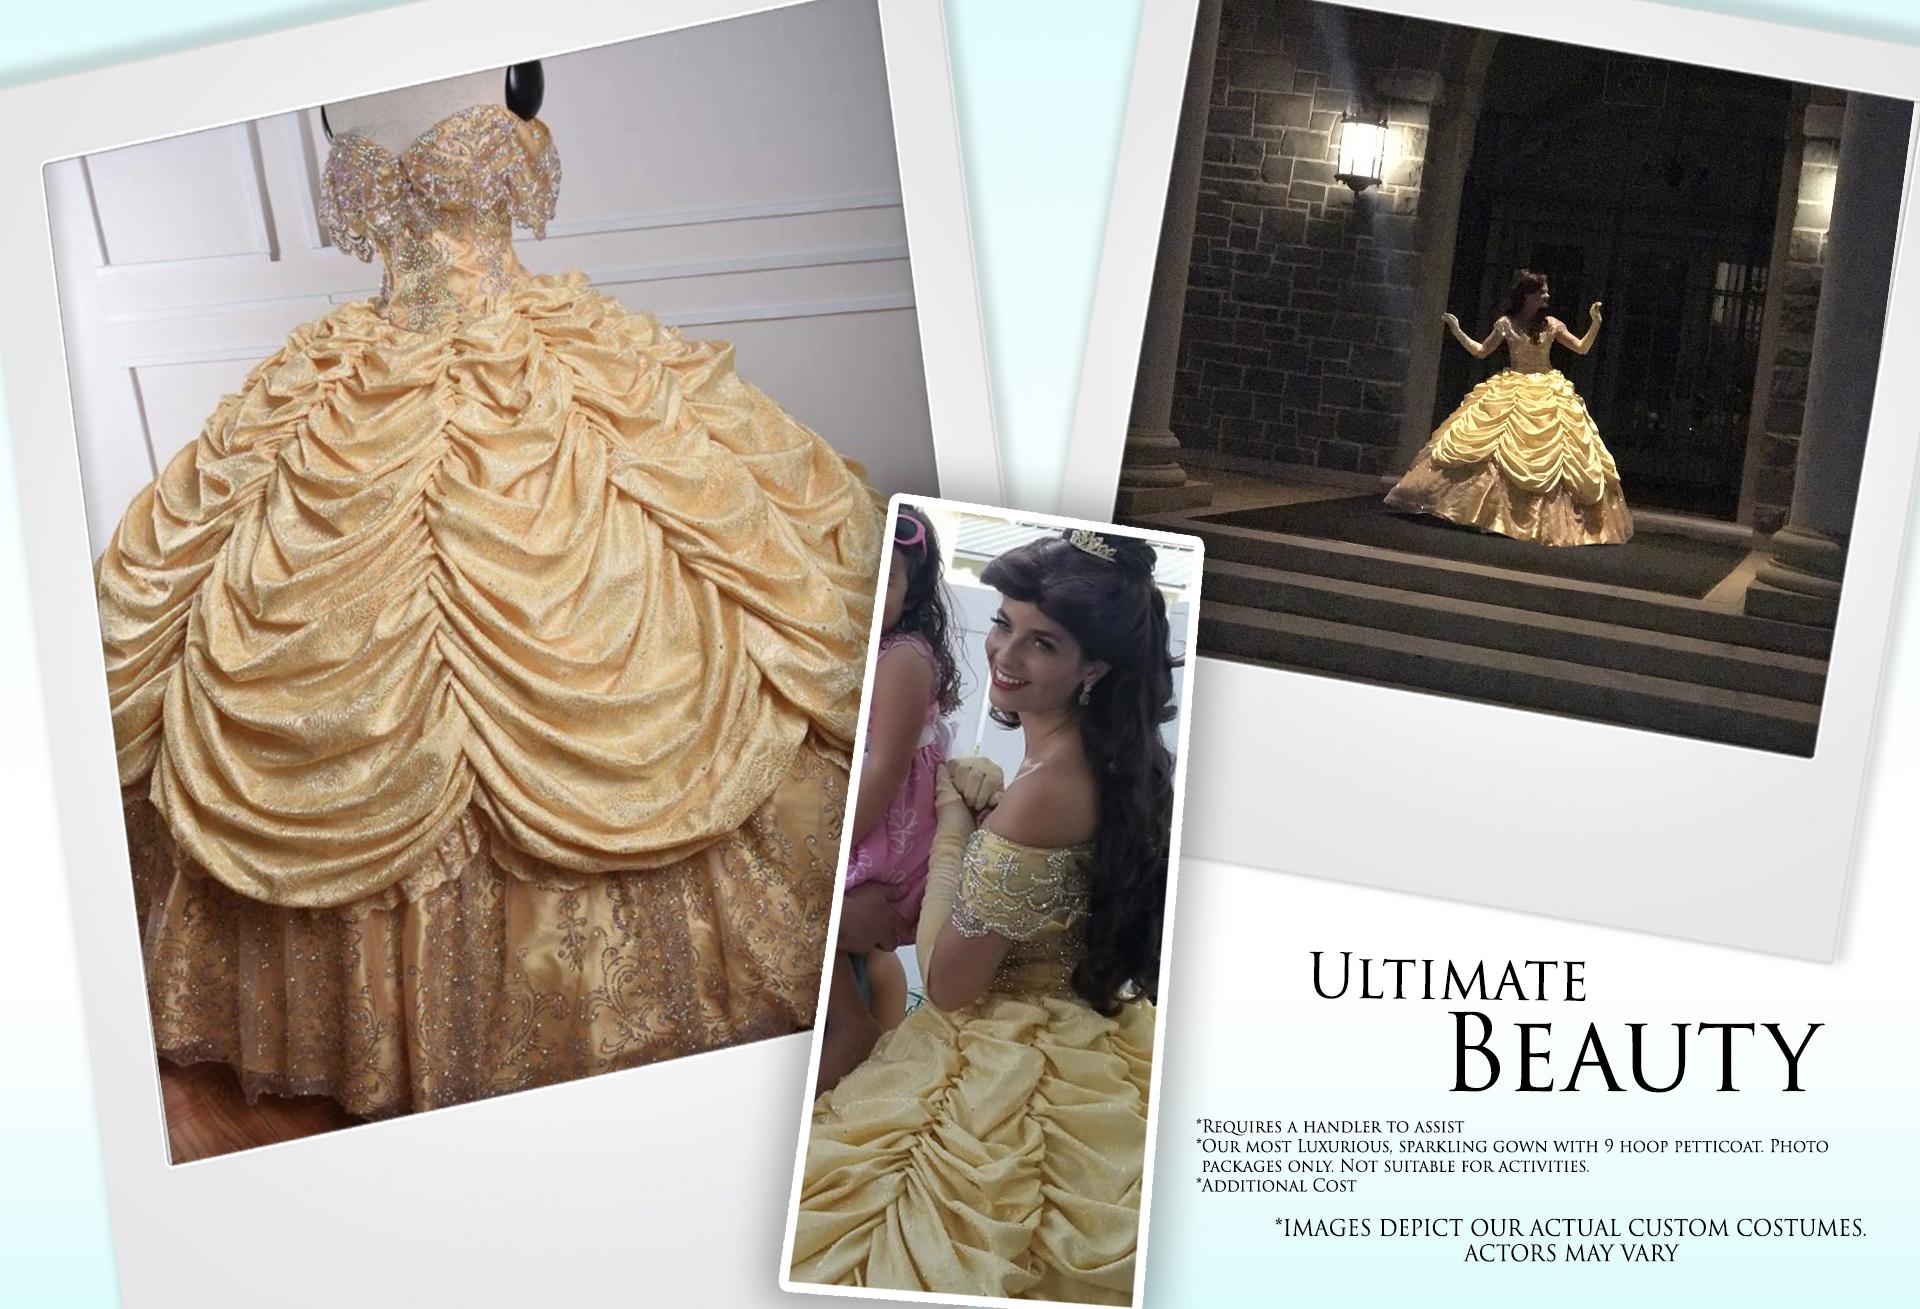 Ultimate Beauty